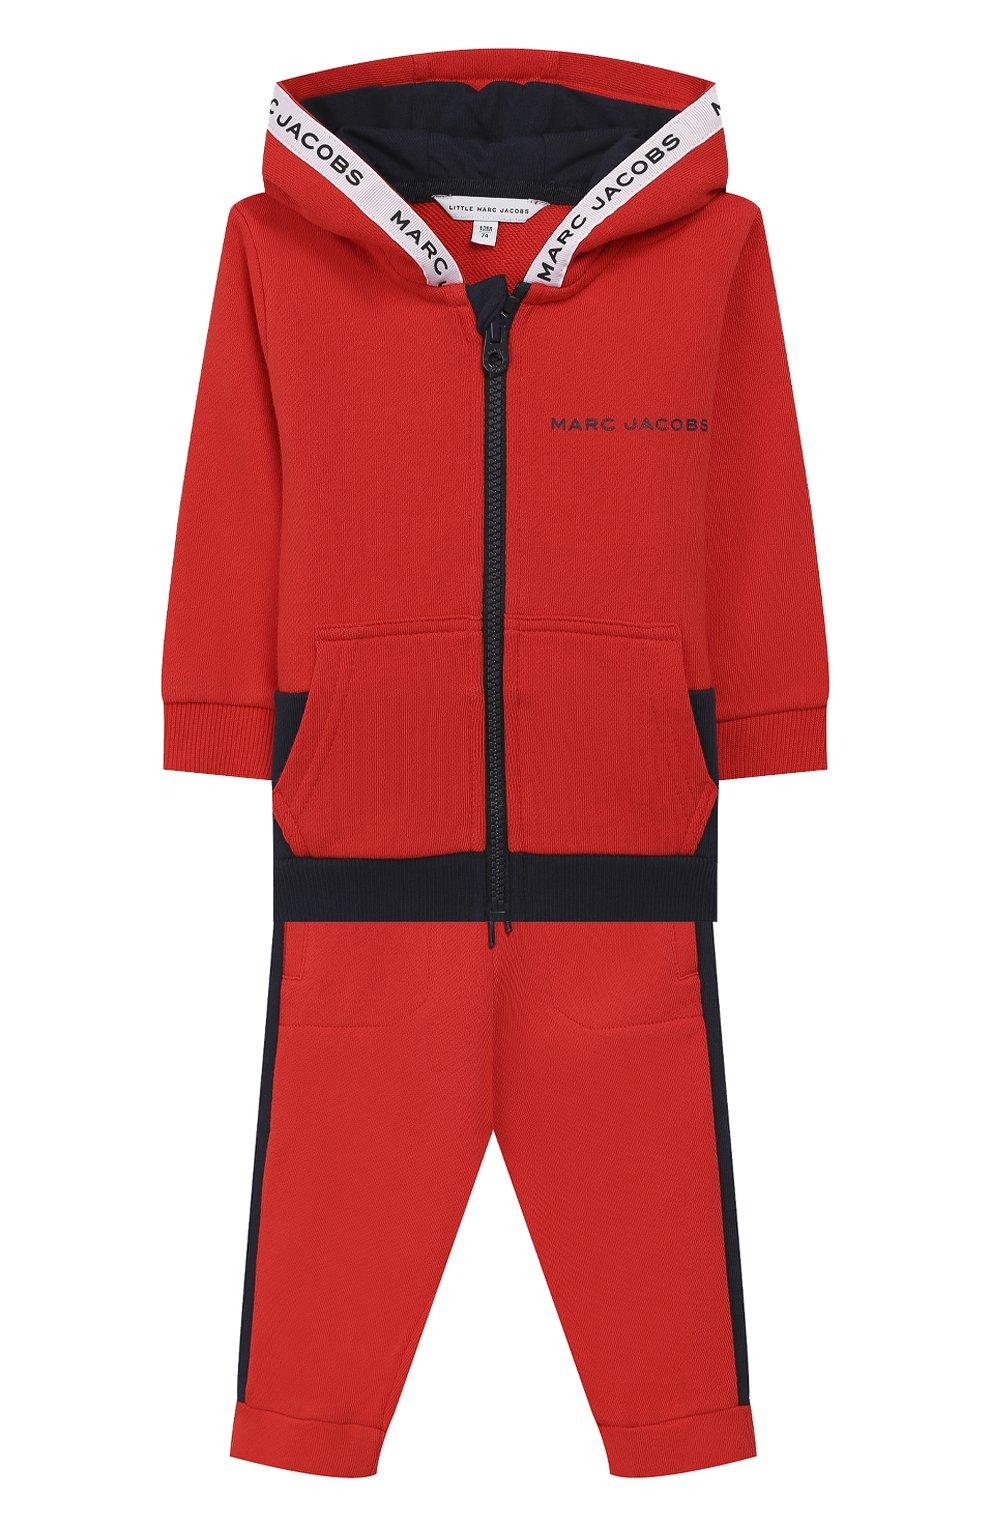 Детский комплект из кардигана и брюк MARC JACOBS (THE) красного цвета, арт. W08070   Фото 1